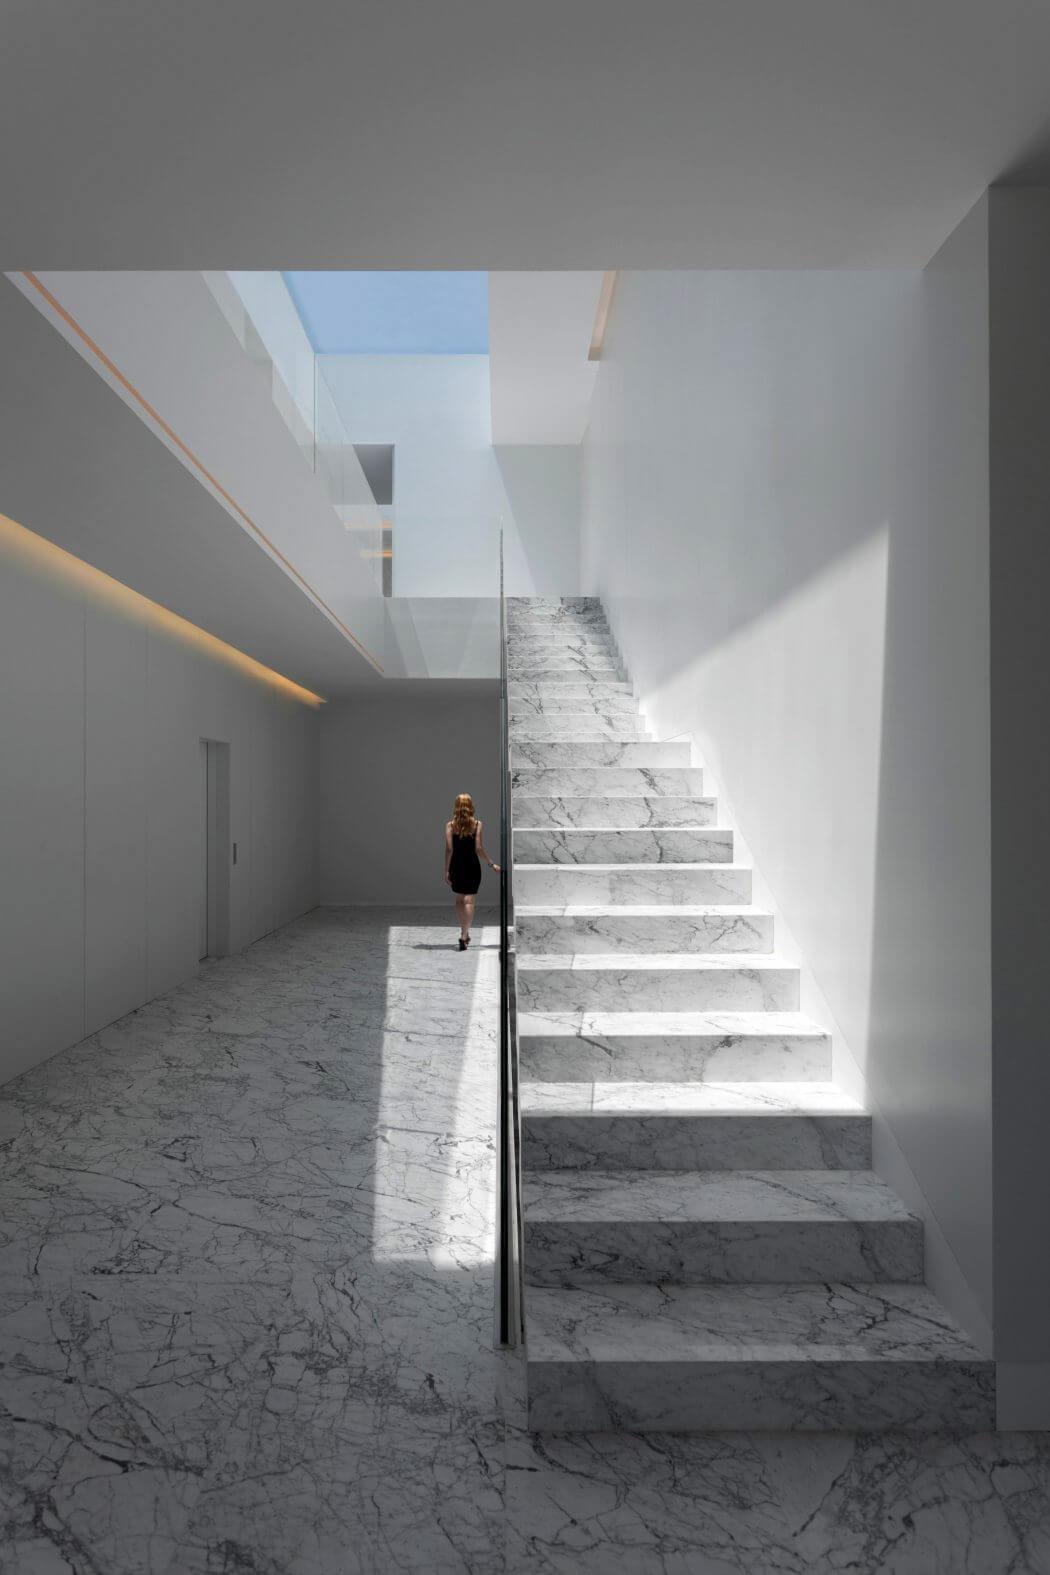 Aluminum house by fran silvestre arquitectos homeadore - Fran silvestre arquitectos ...